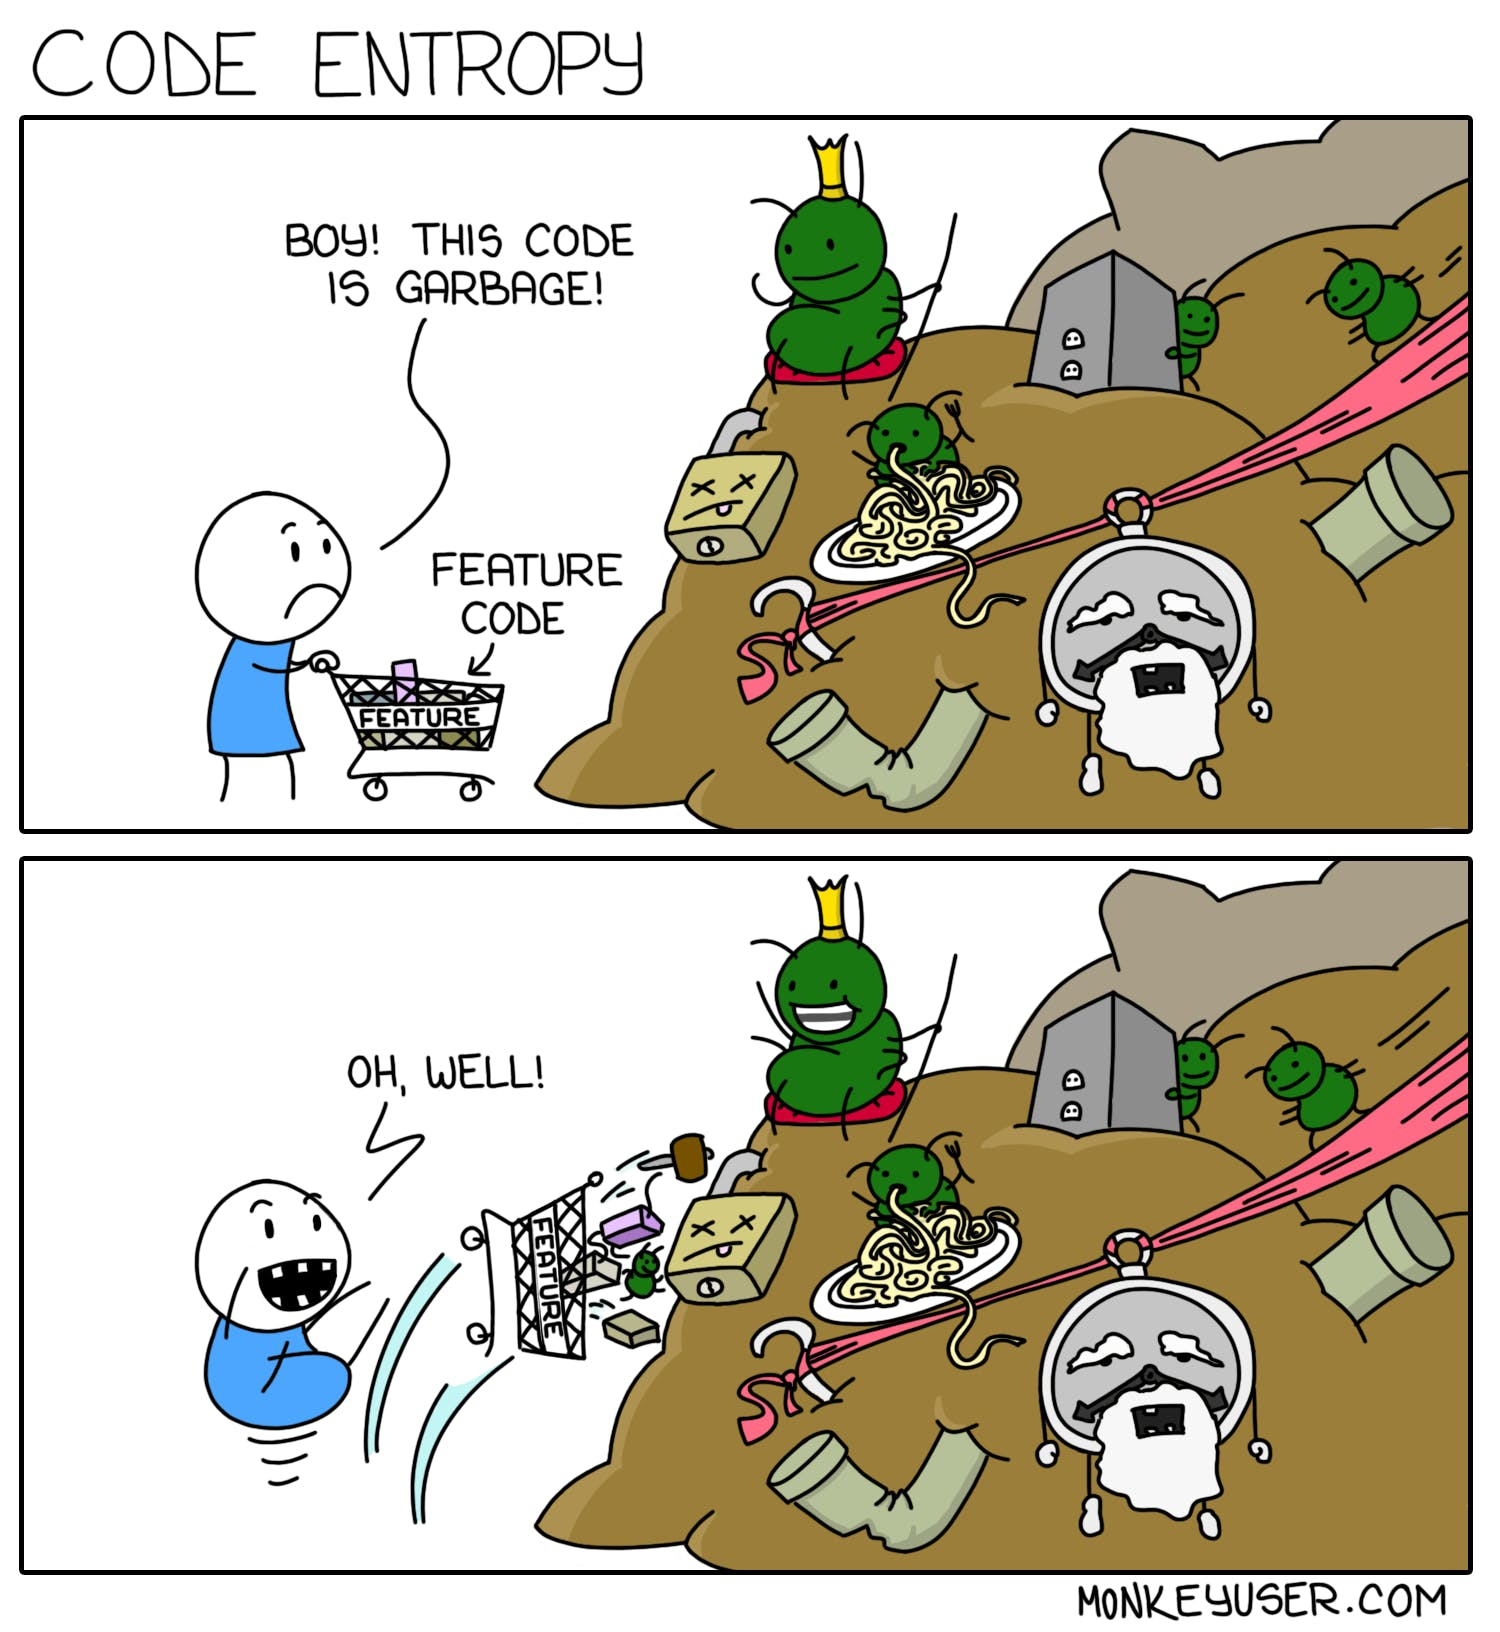 119-code-entropy.png